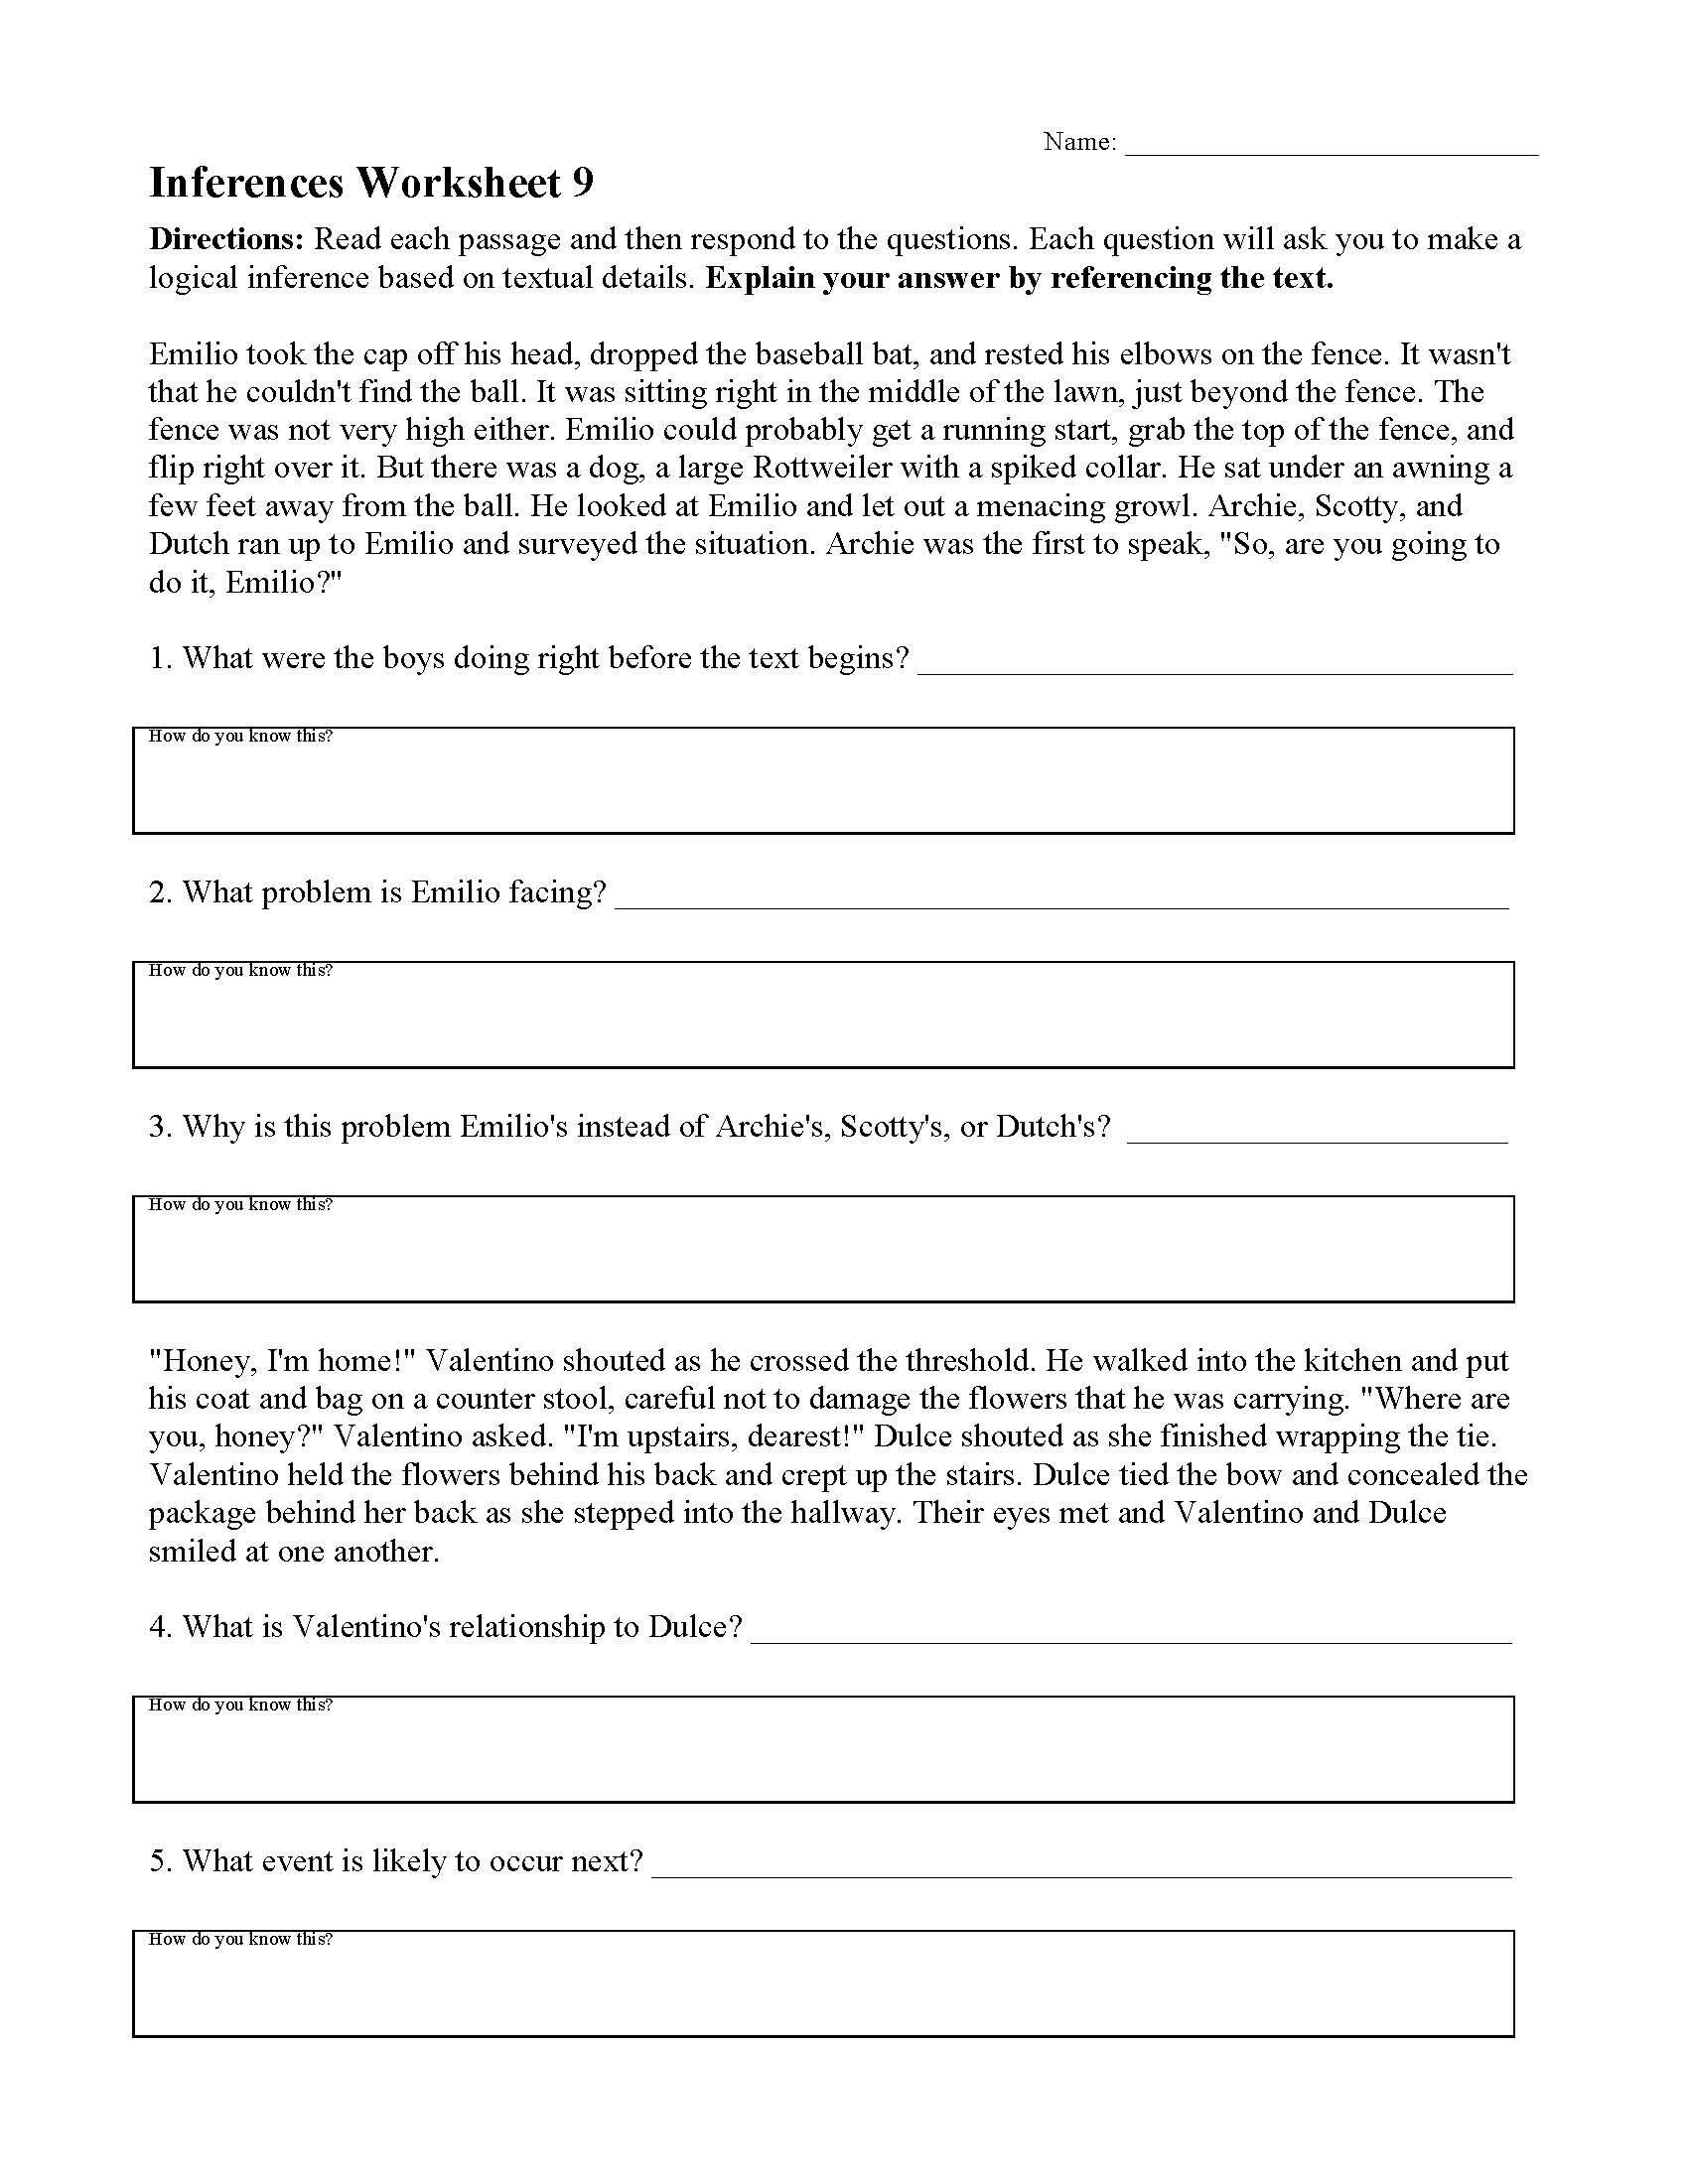 Inferences Worksheet 2 Inferencing 2nd Grade Worksheets 5th Grade Worksheets